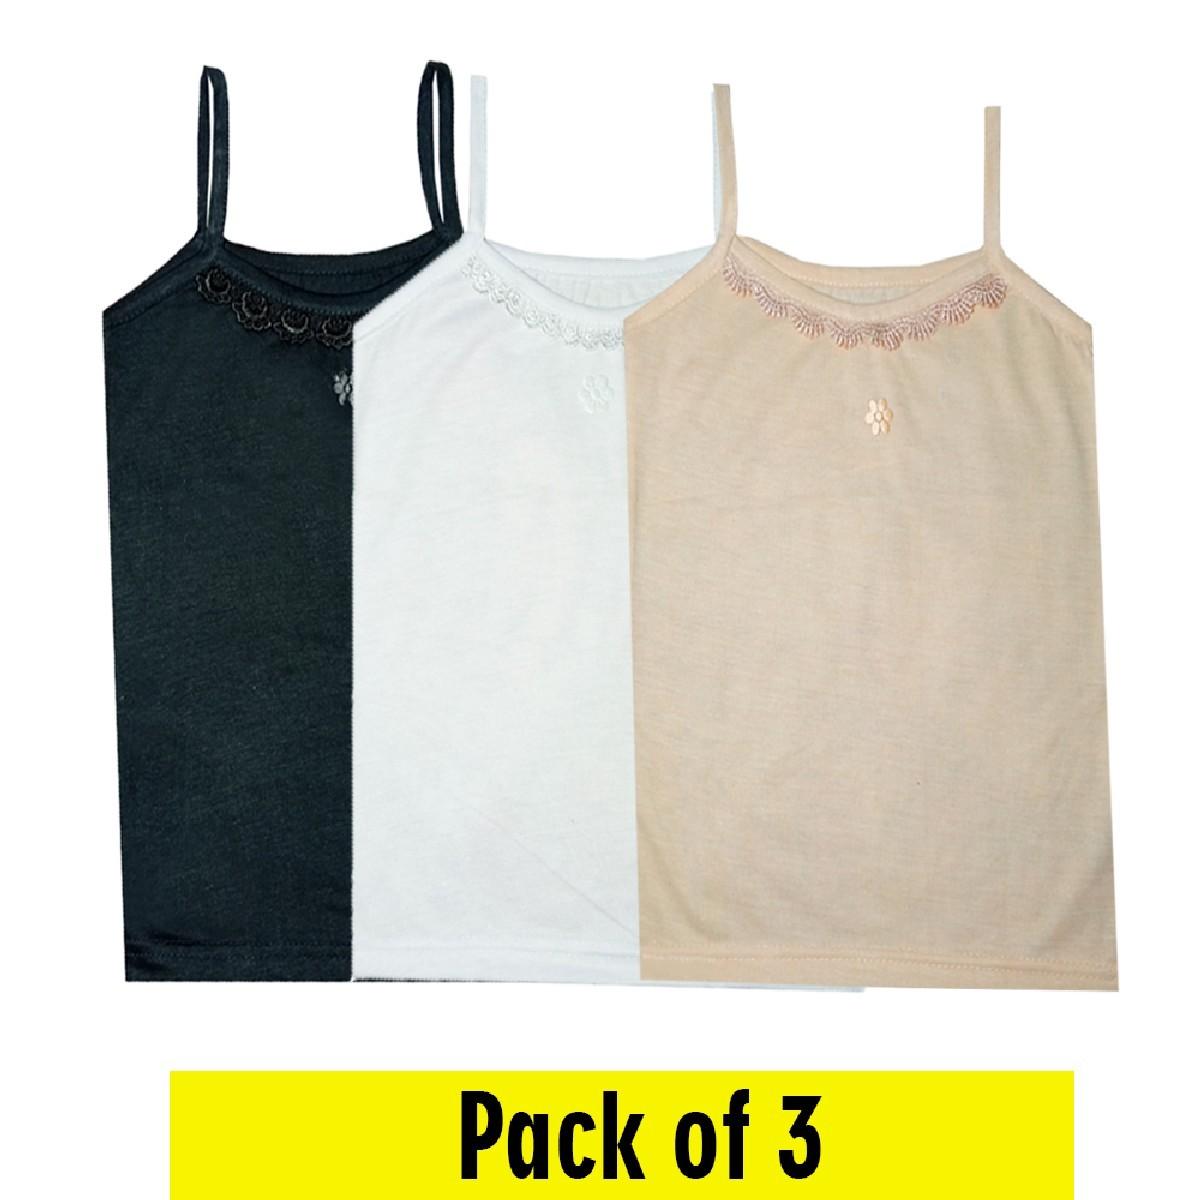 Pack of 3 - Thin Straps Cotton Tank Tops & Slips/Full Camisole/Full Shameez For Girls & Women's - Size Medium/Large